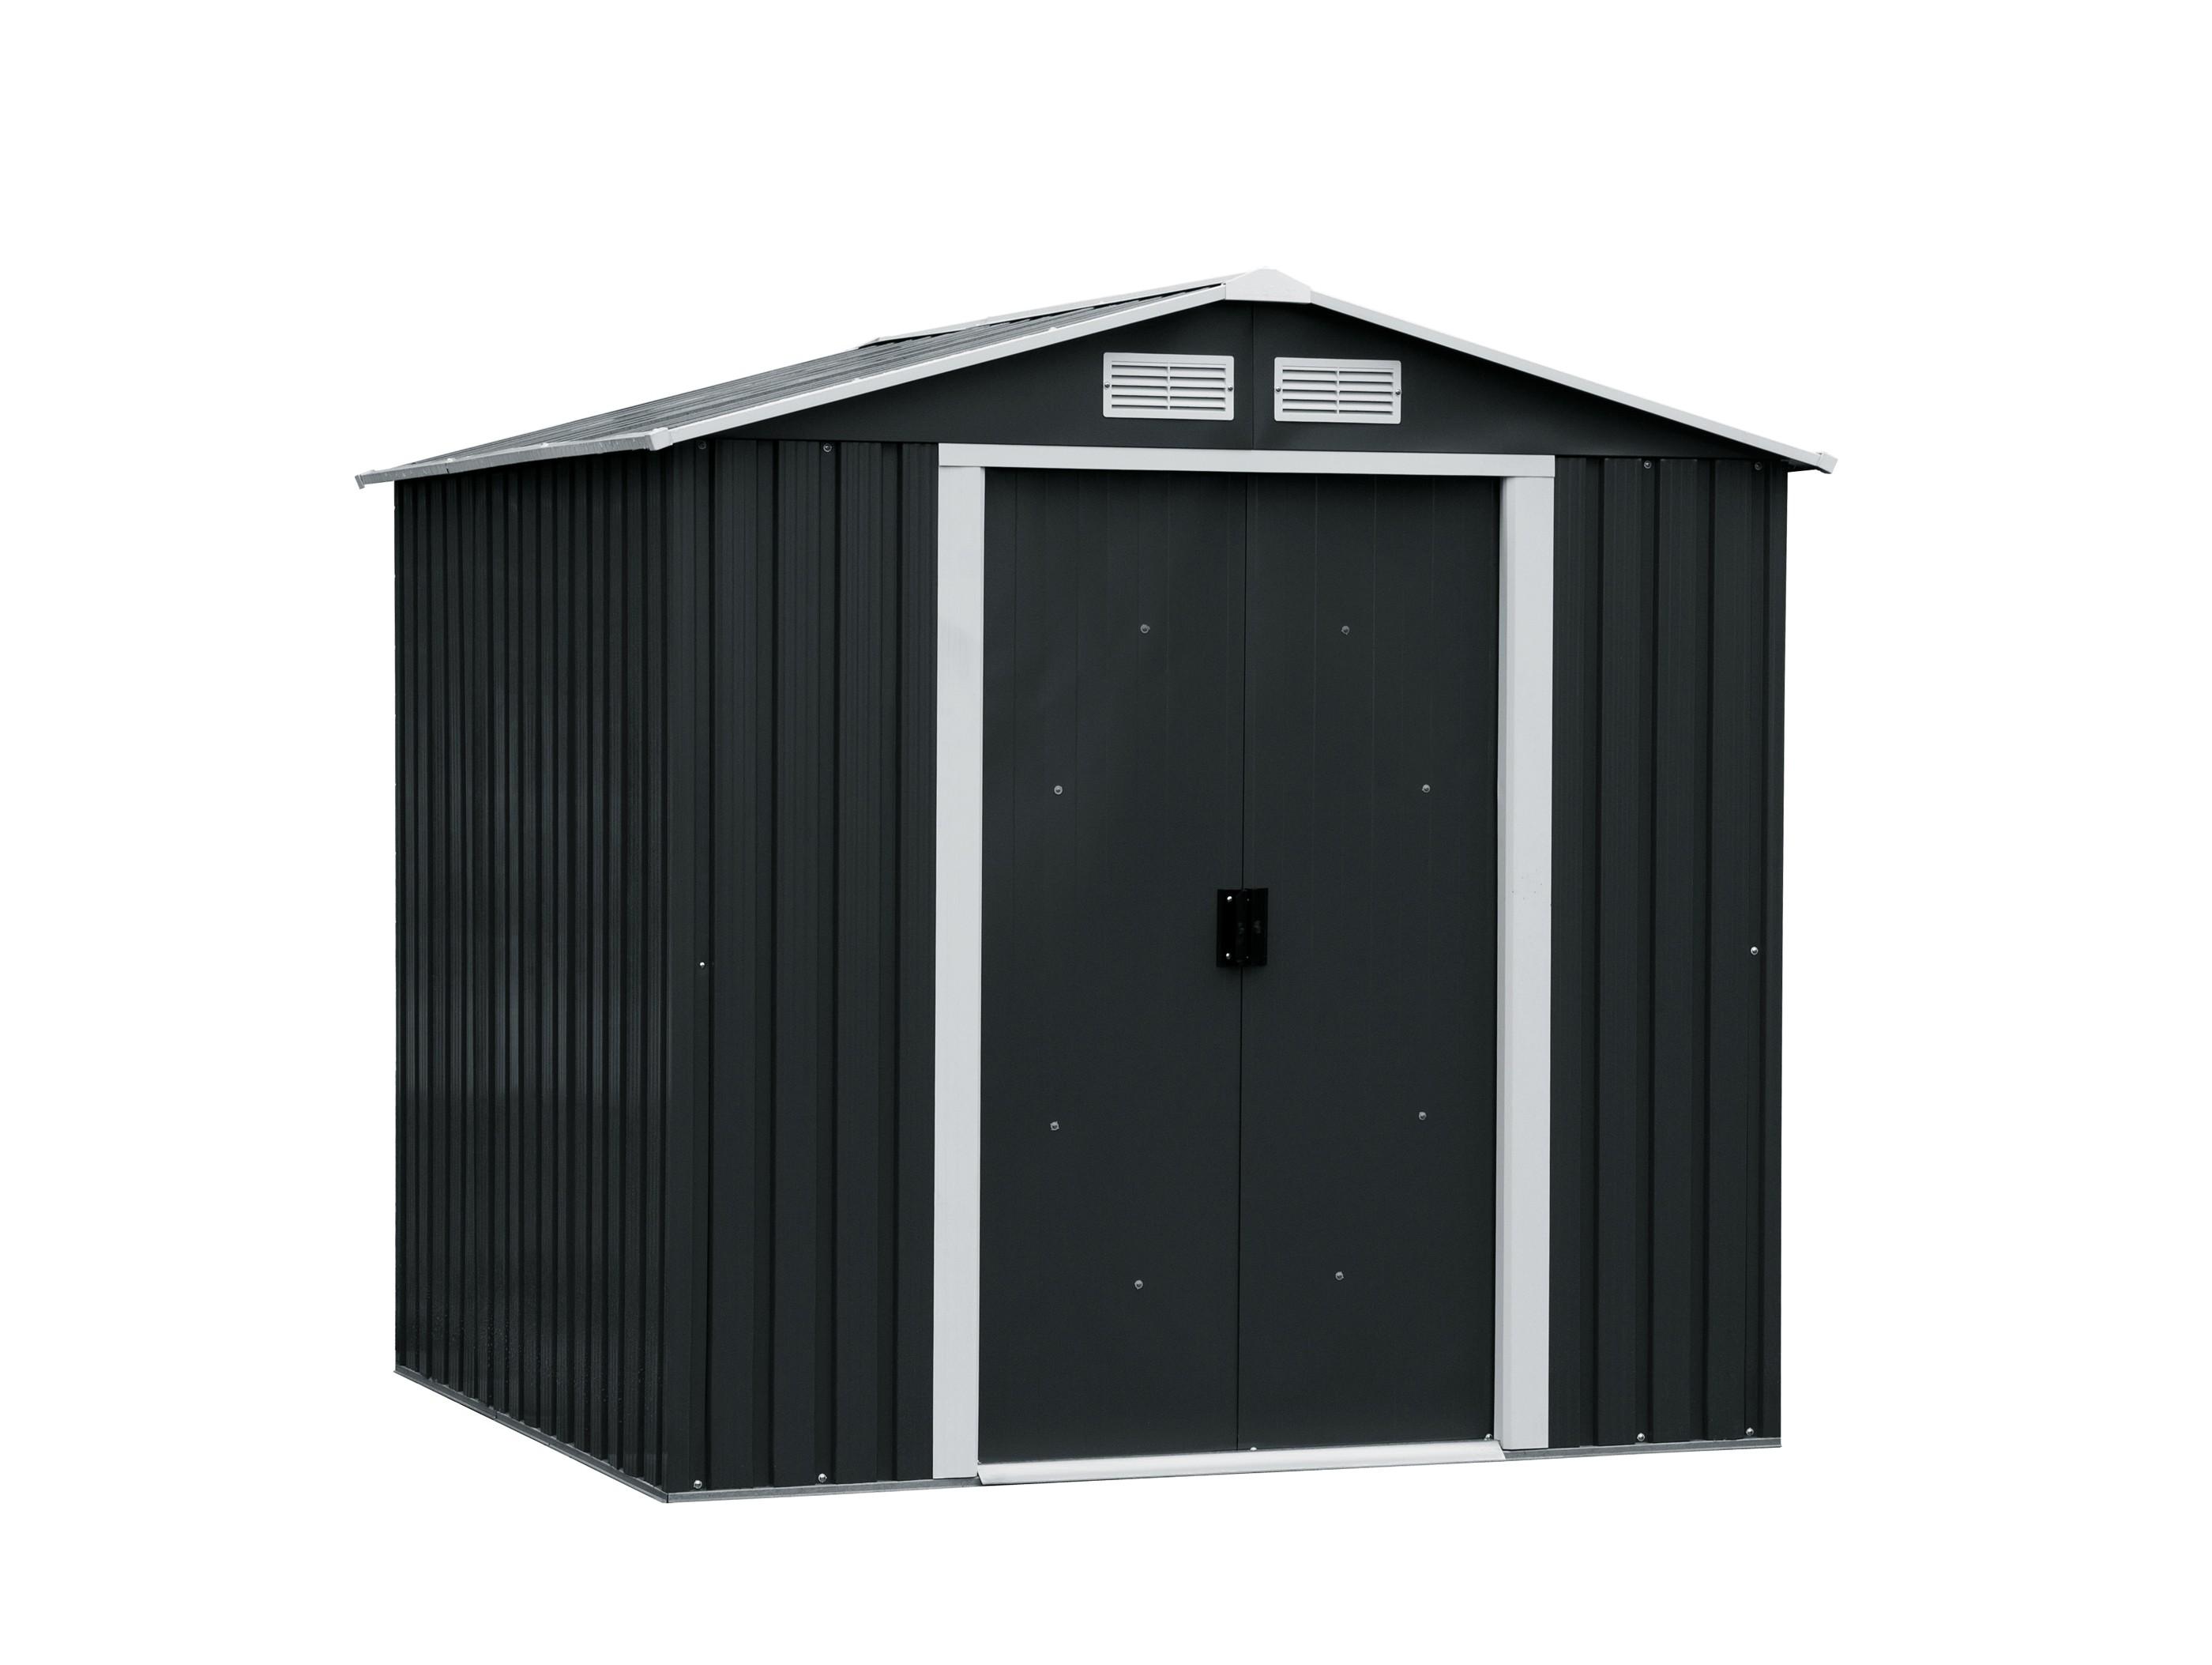 tepro ger tehaus metall riverton 6x6 unterkonstr anthrazit 201x182 3 bei. Black Bedroom Furniture Sets. Home Design Ideas